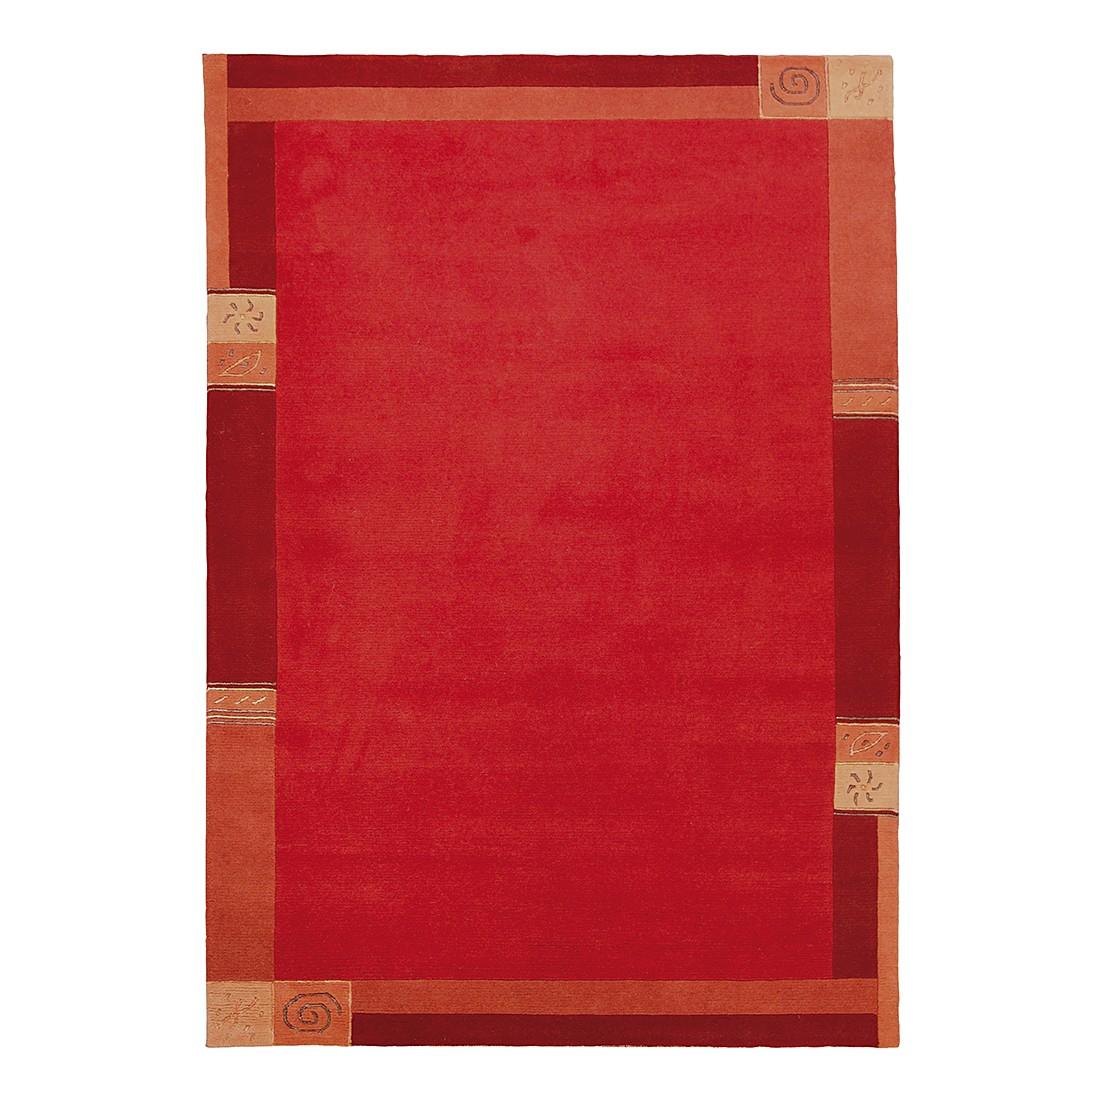 teppich manali wolle rot 120 cm x 180 cm luxor living g nstig bestellen. Black Bedroom Furniture Sets. Home Design Ideas